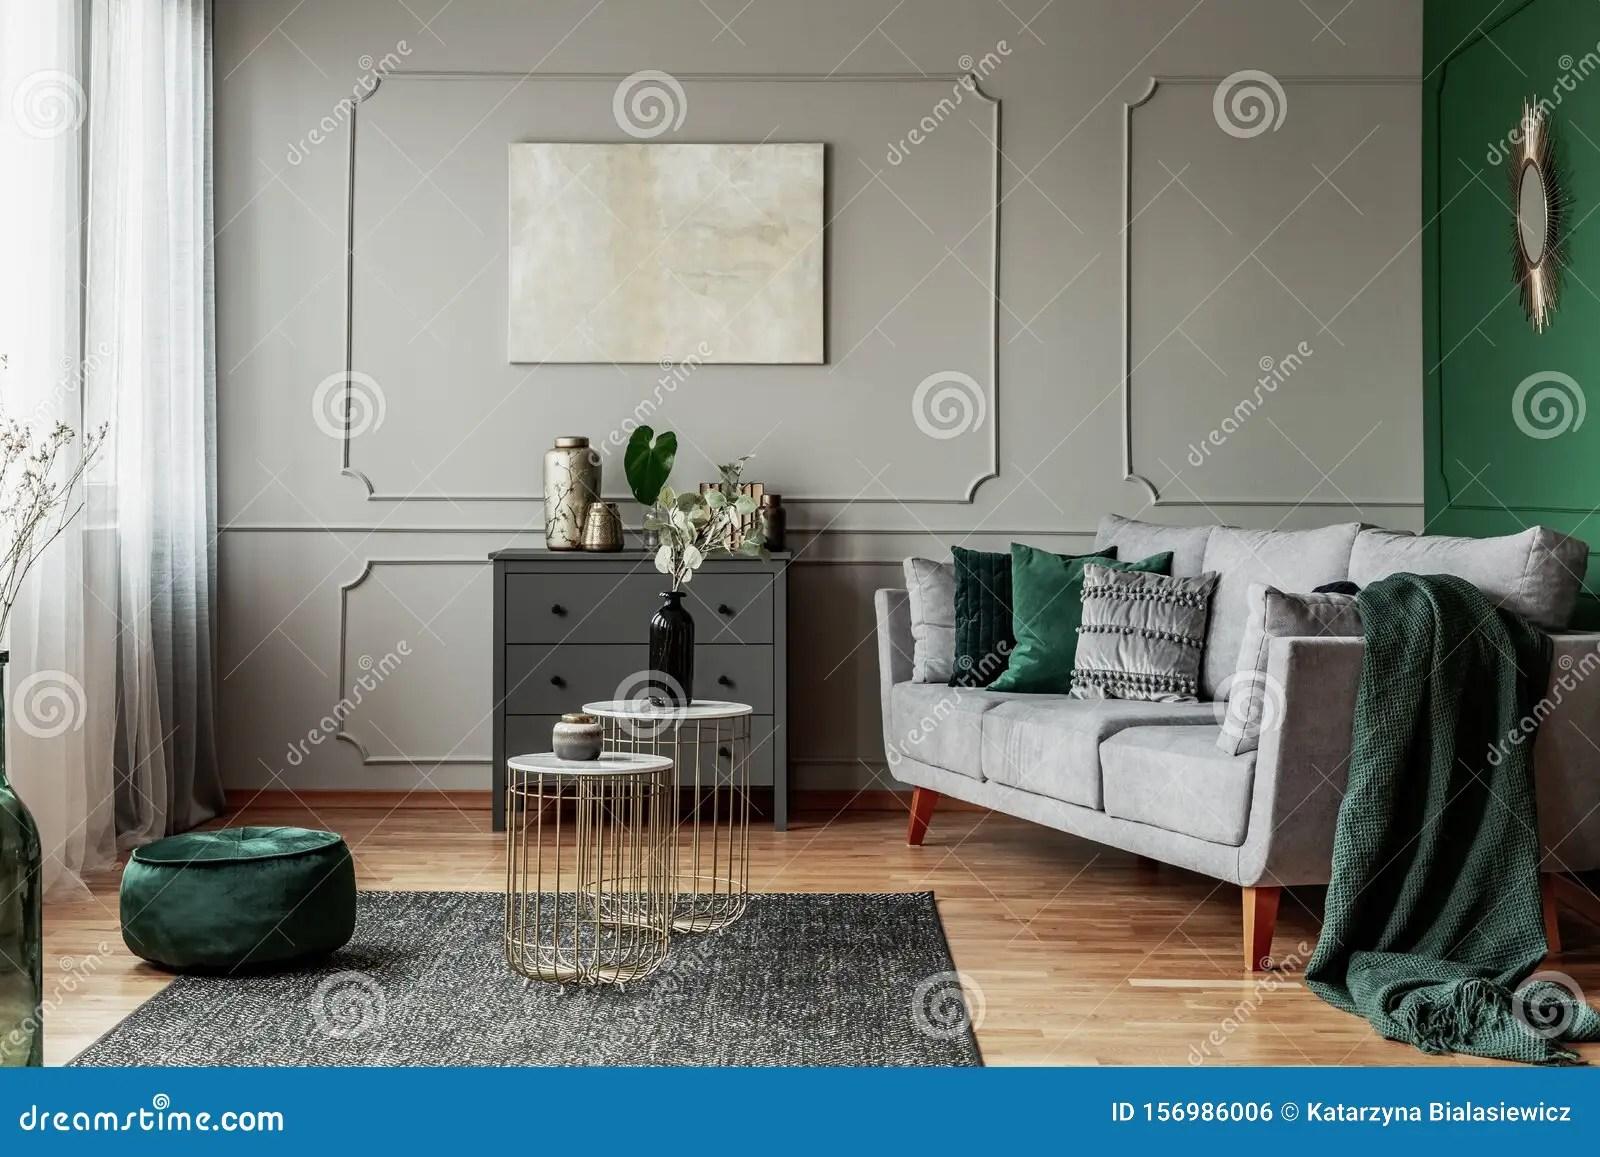 meraude et gris avec peinture abstraite